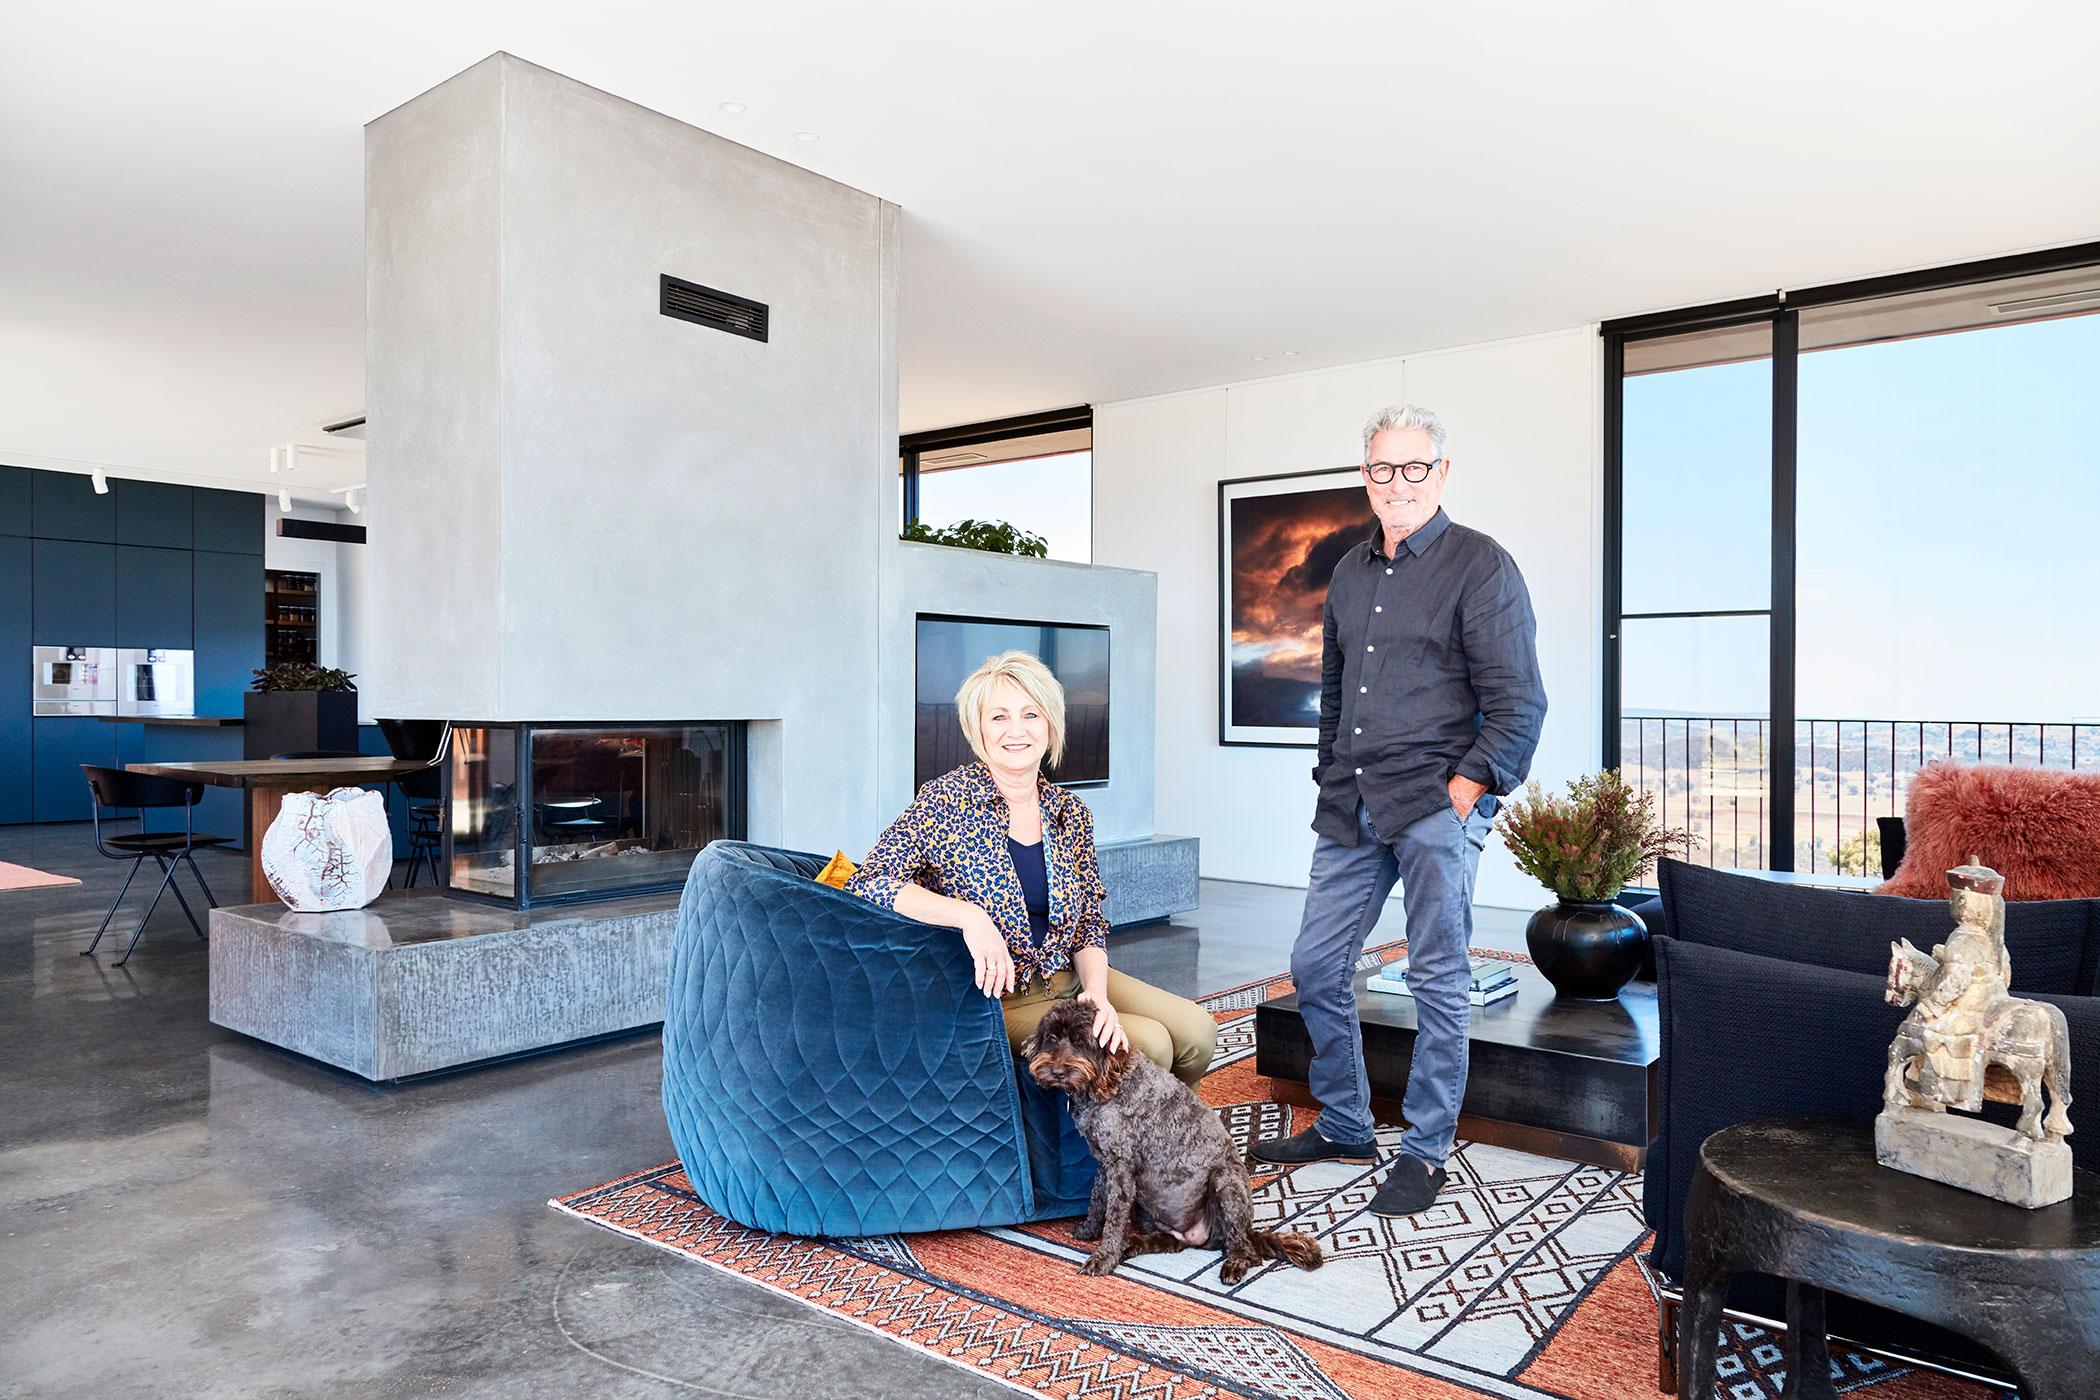 GRAND DESIGNS AUSTRALIA SERIES 8 HOST & HOME OWNER PORTRAITS